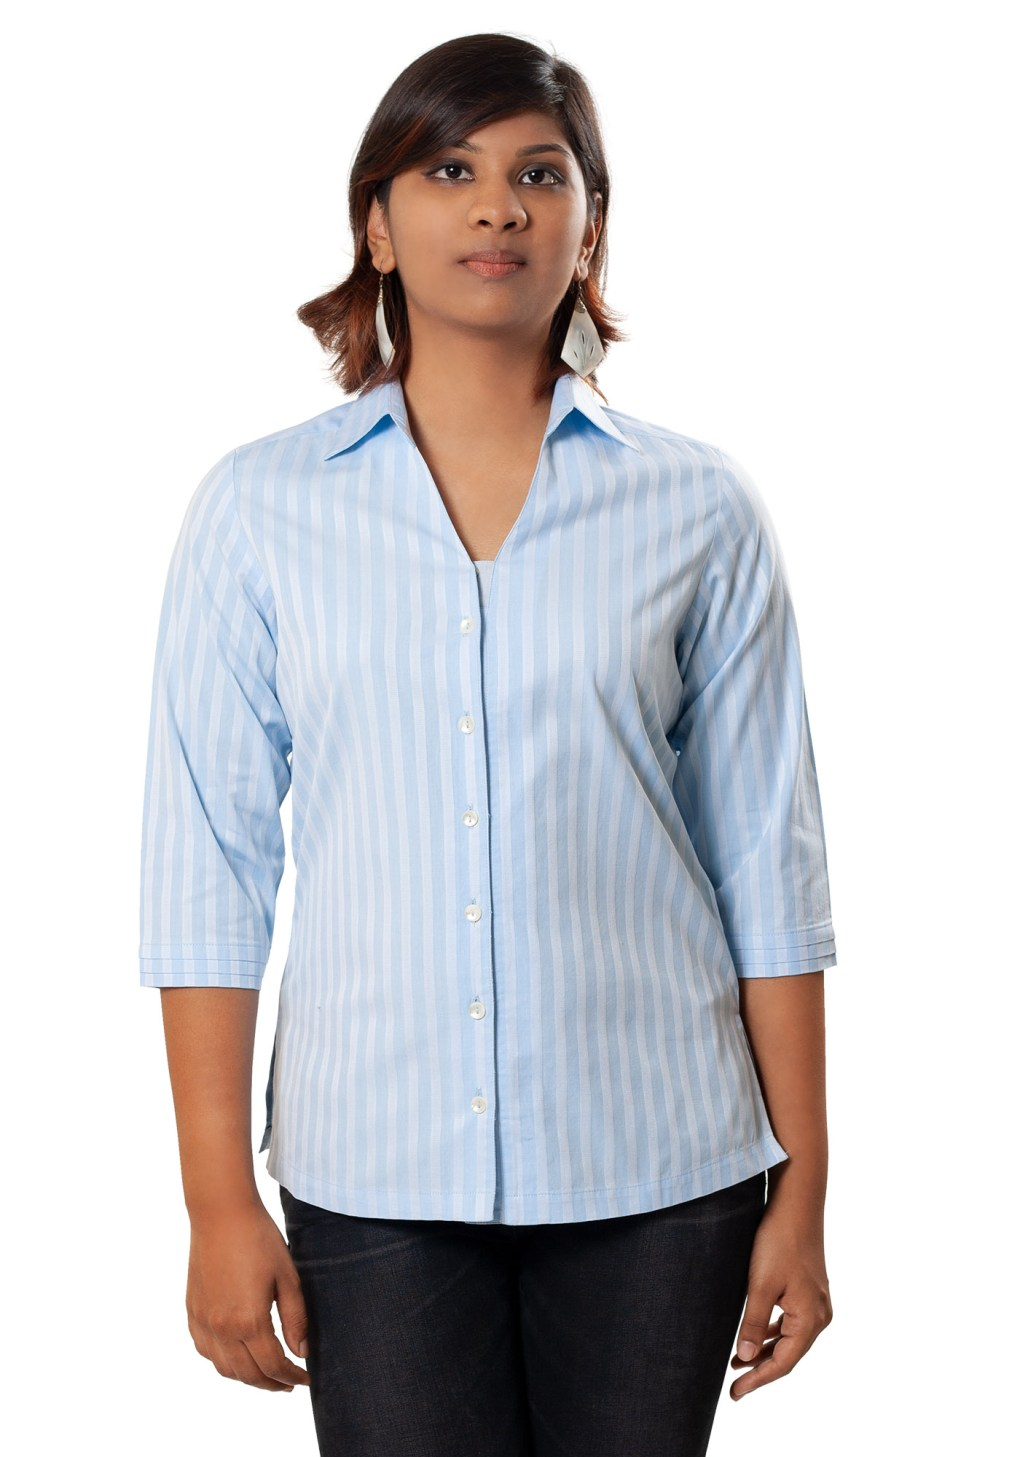 MINC Classic Striped Blue Cotton Shirt